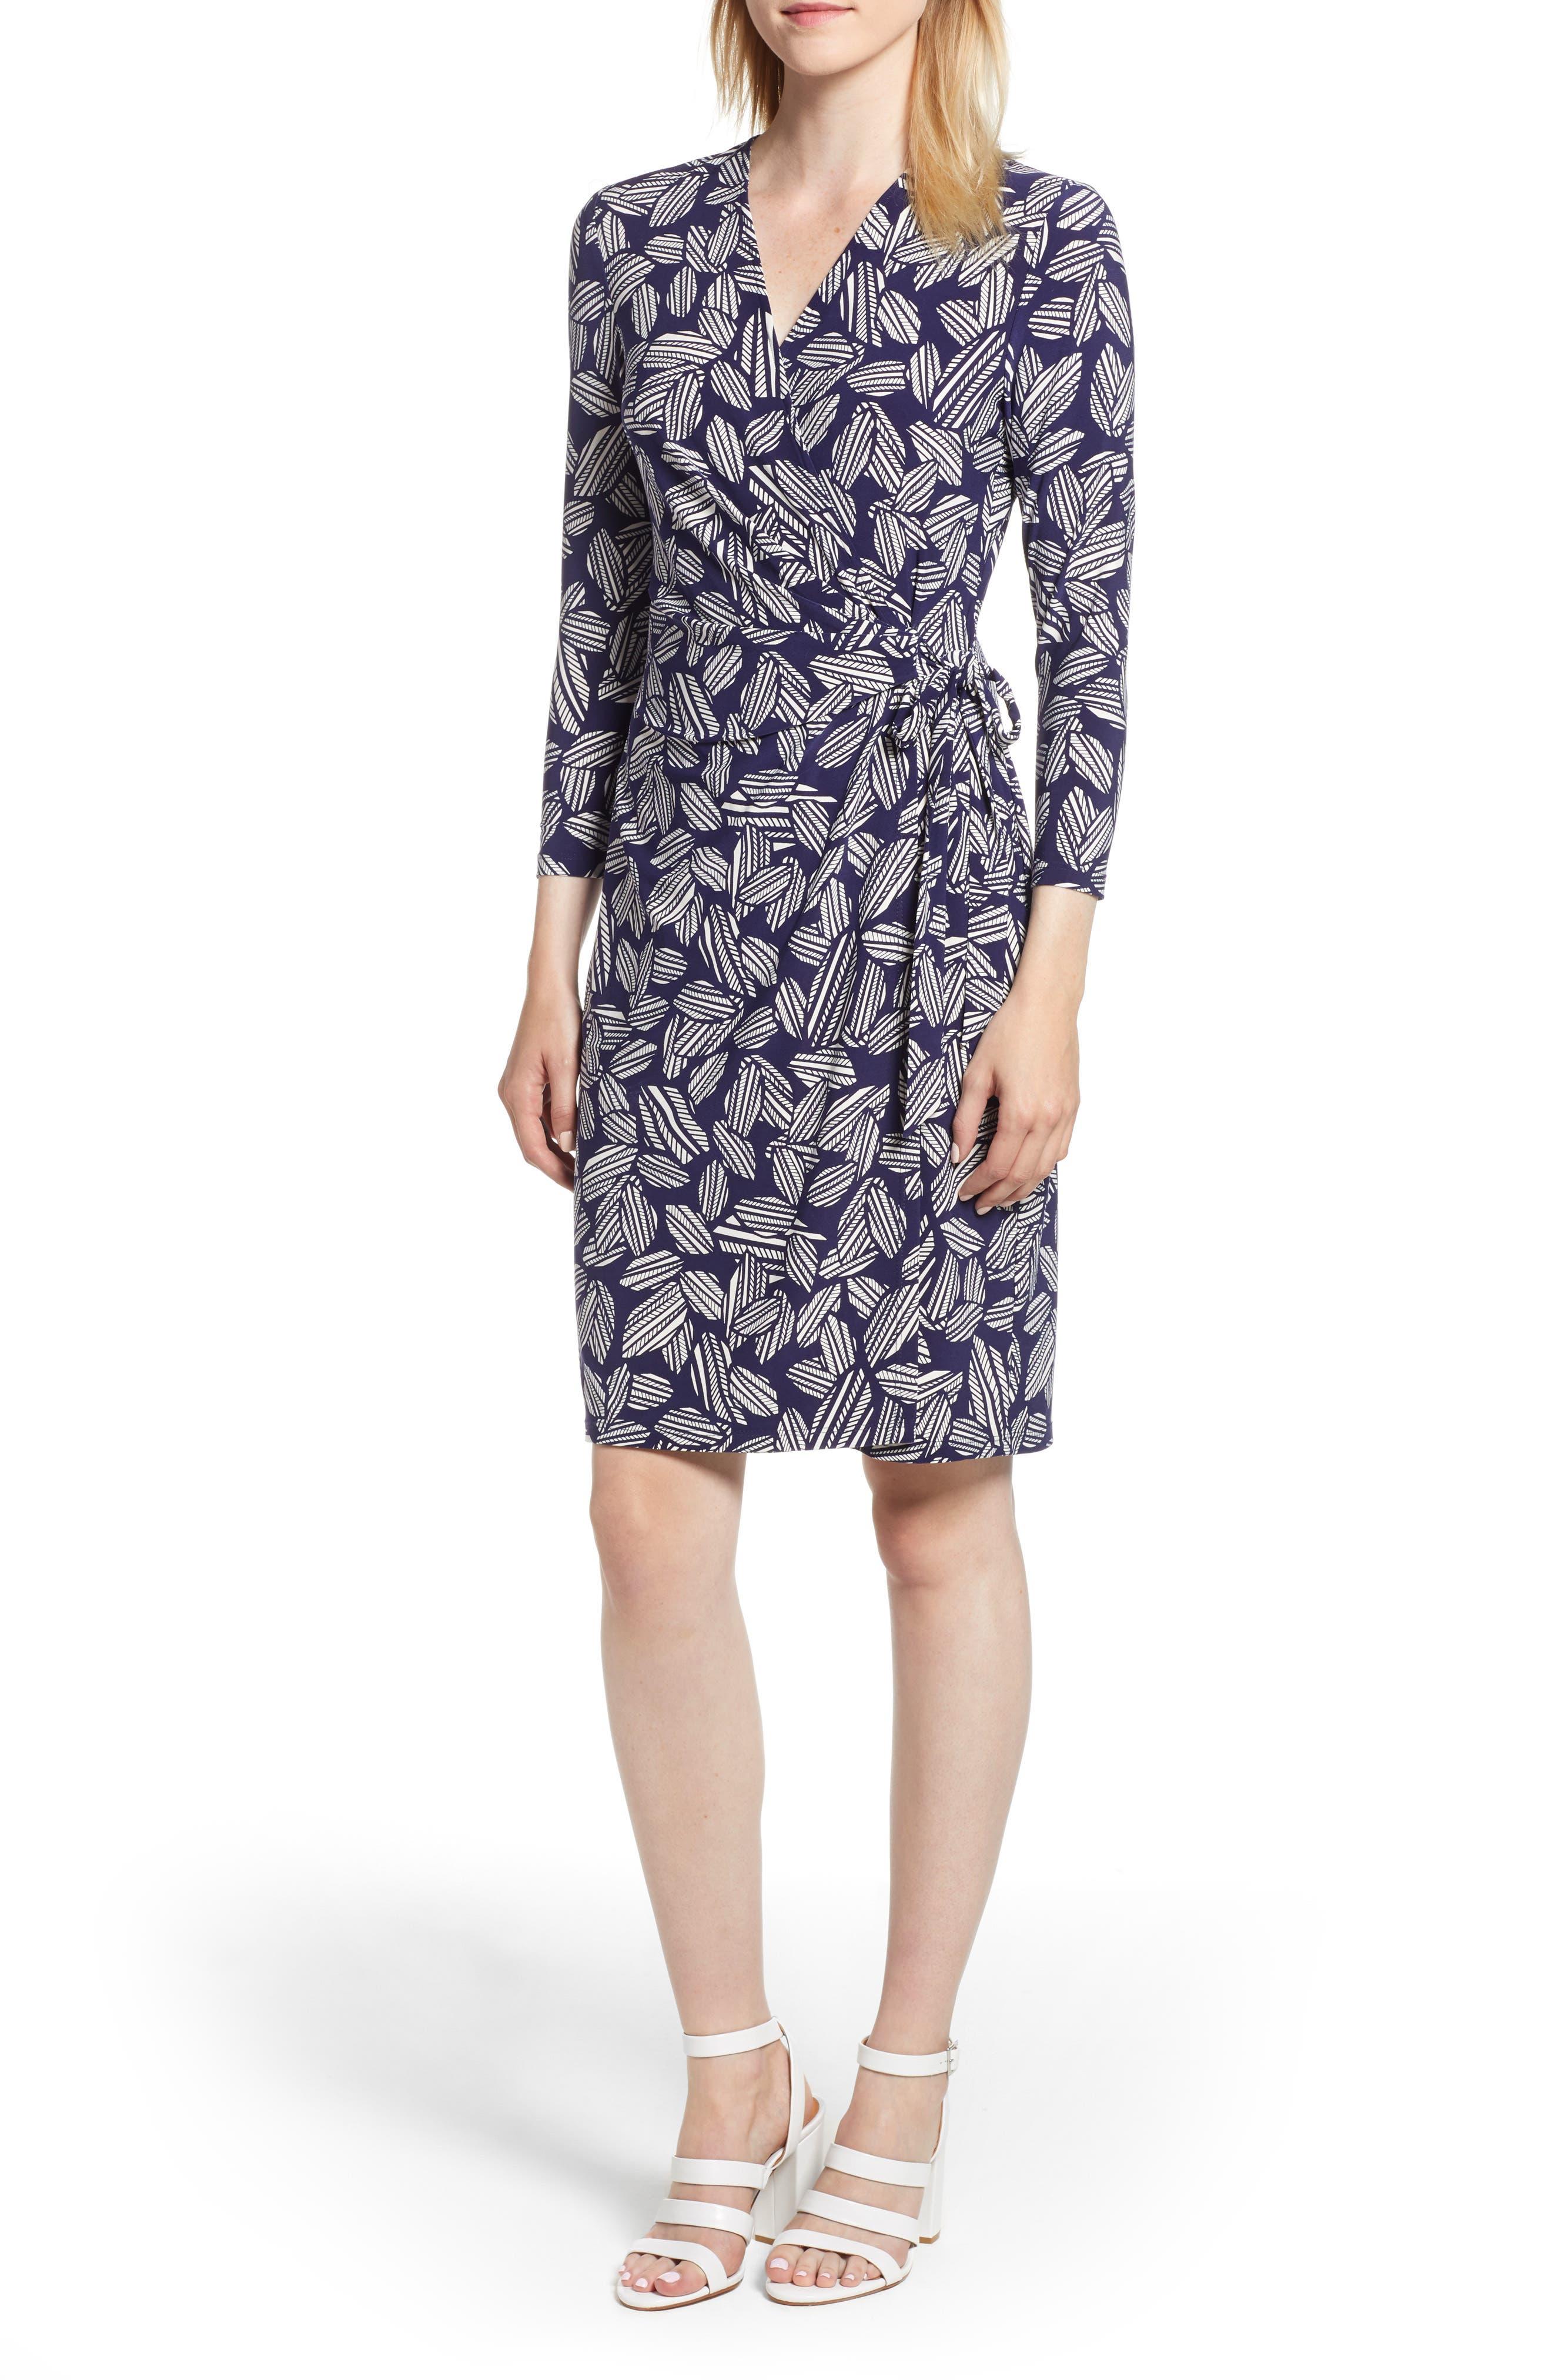 ANNE KLEIN LEAF PRINT FAUX WRAP DRESS